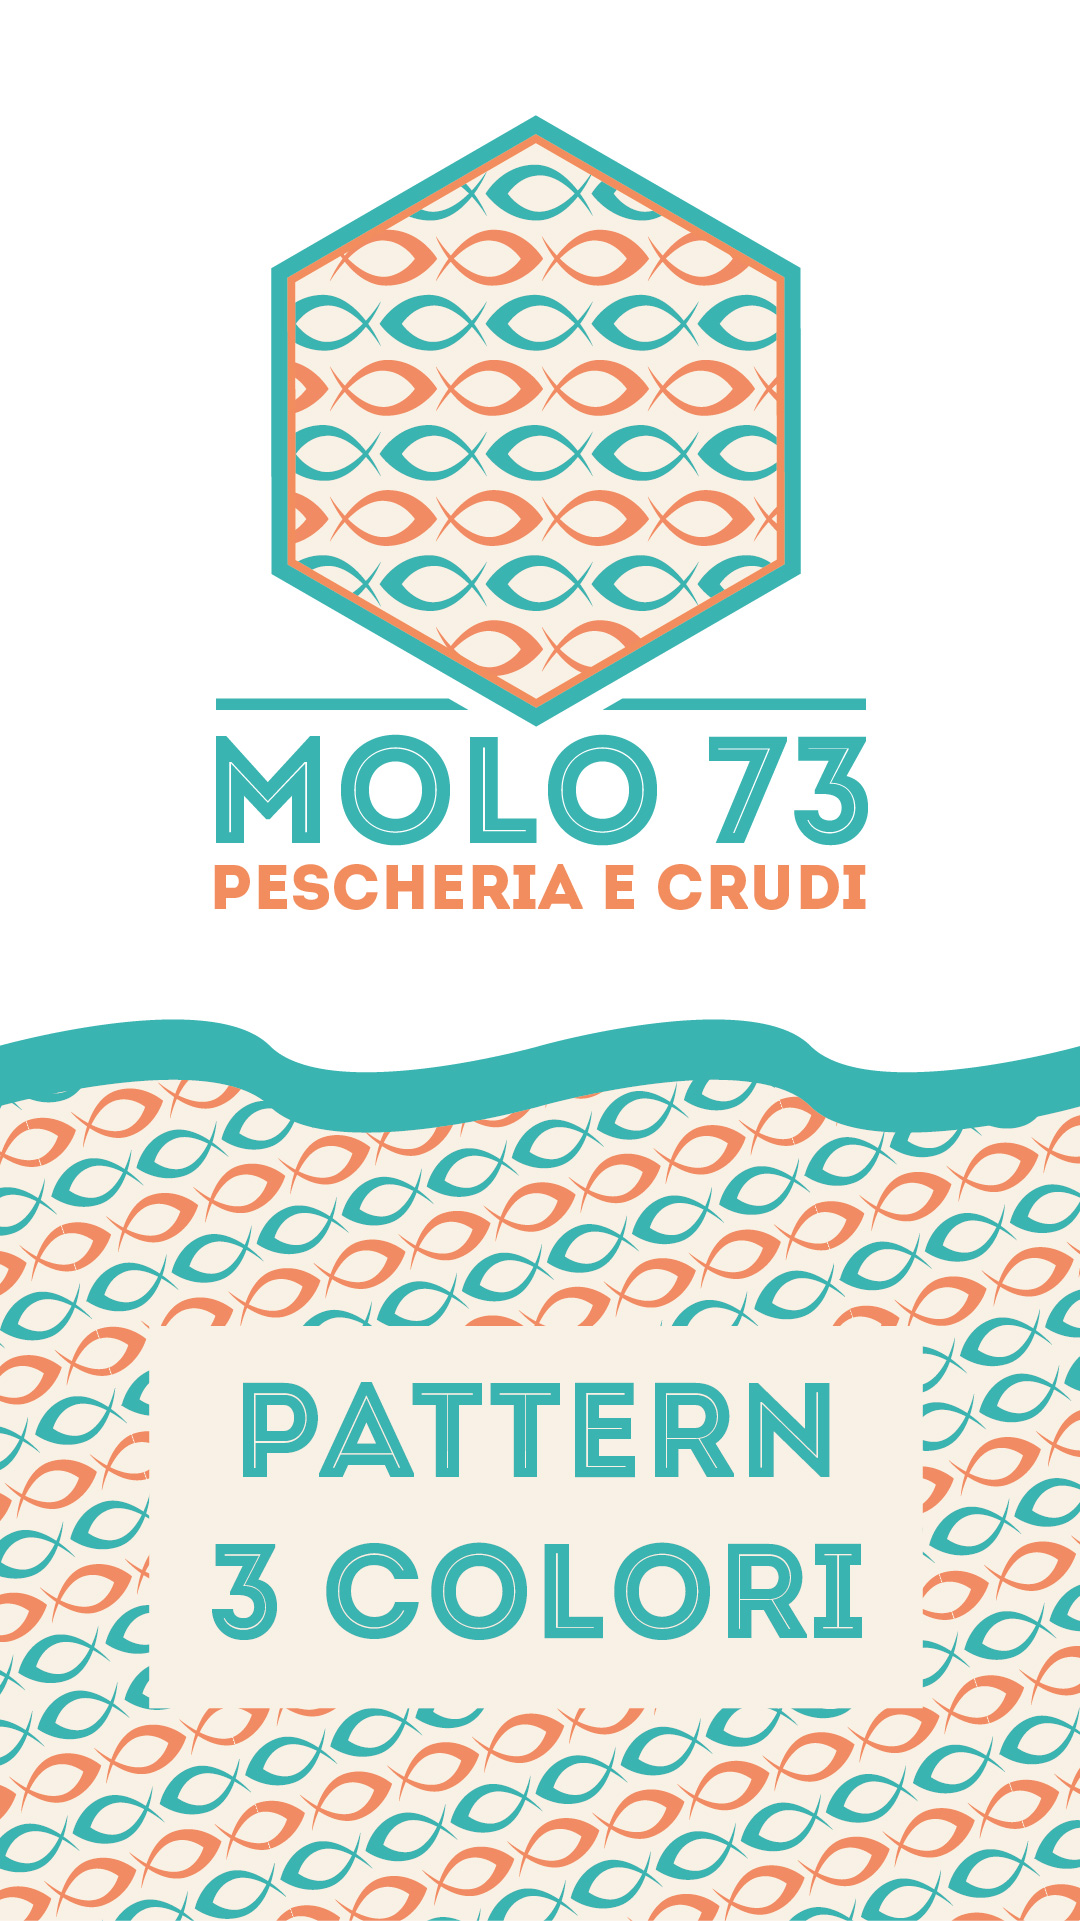 https://www.orlandinifrancesco.com/wp/wp-content/uploads/2019/01/Molo-72-Logo-1.jpg